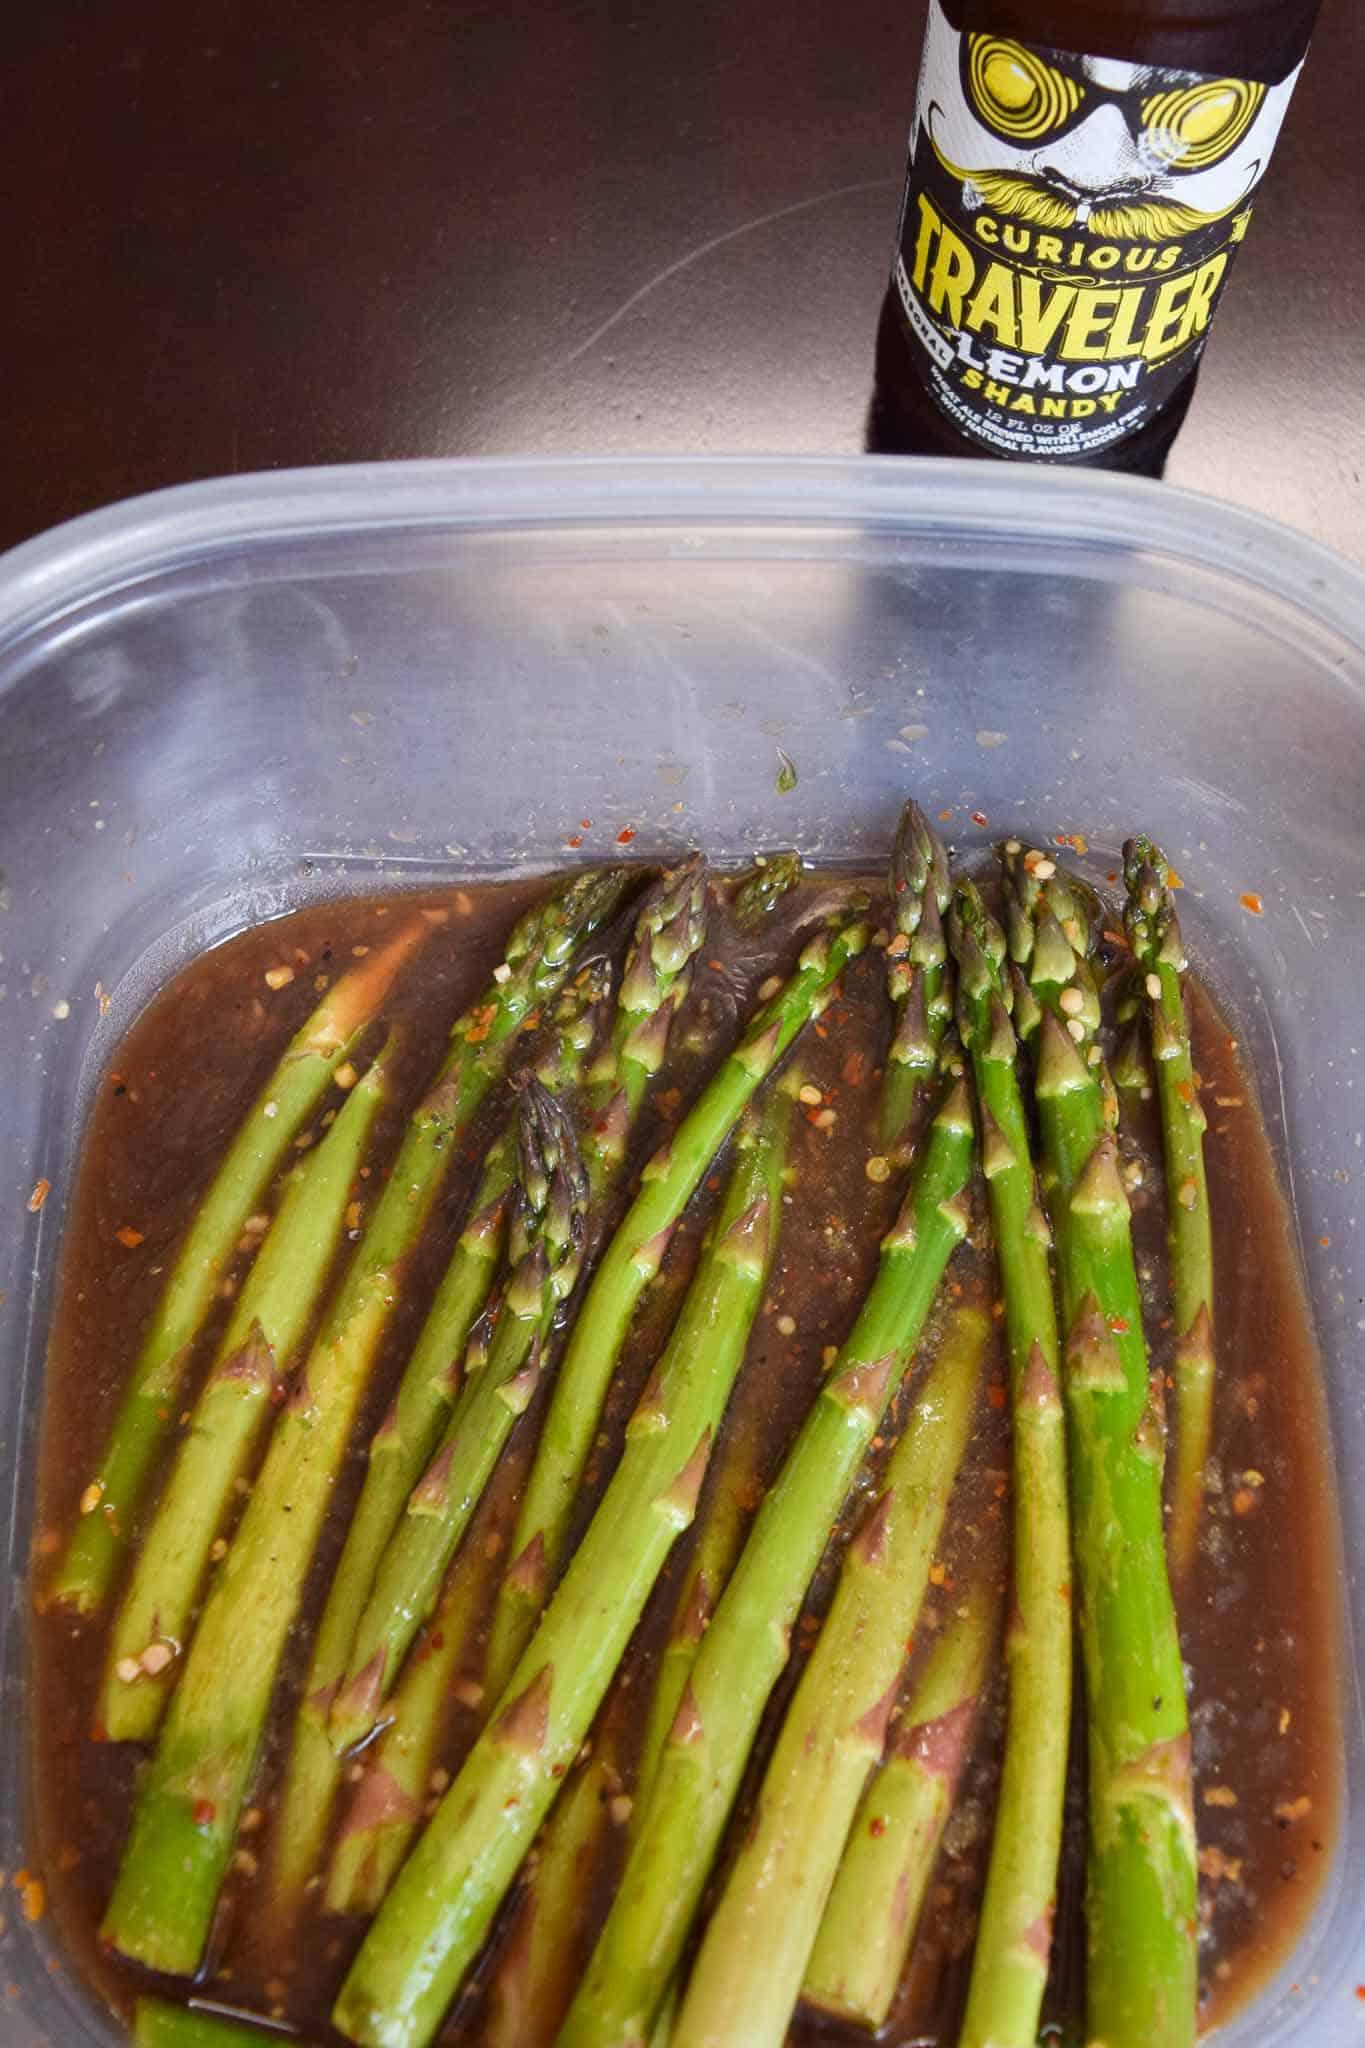 Asparagus marinating in Tupperware container